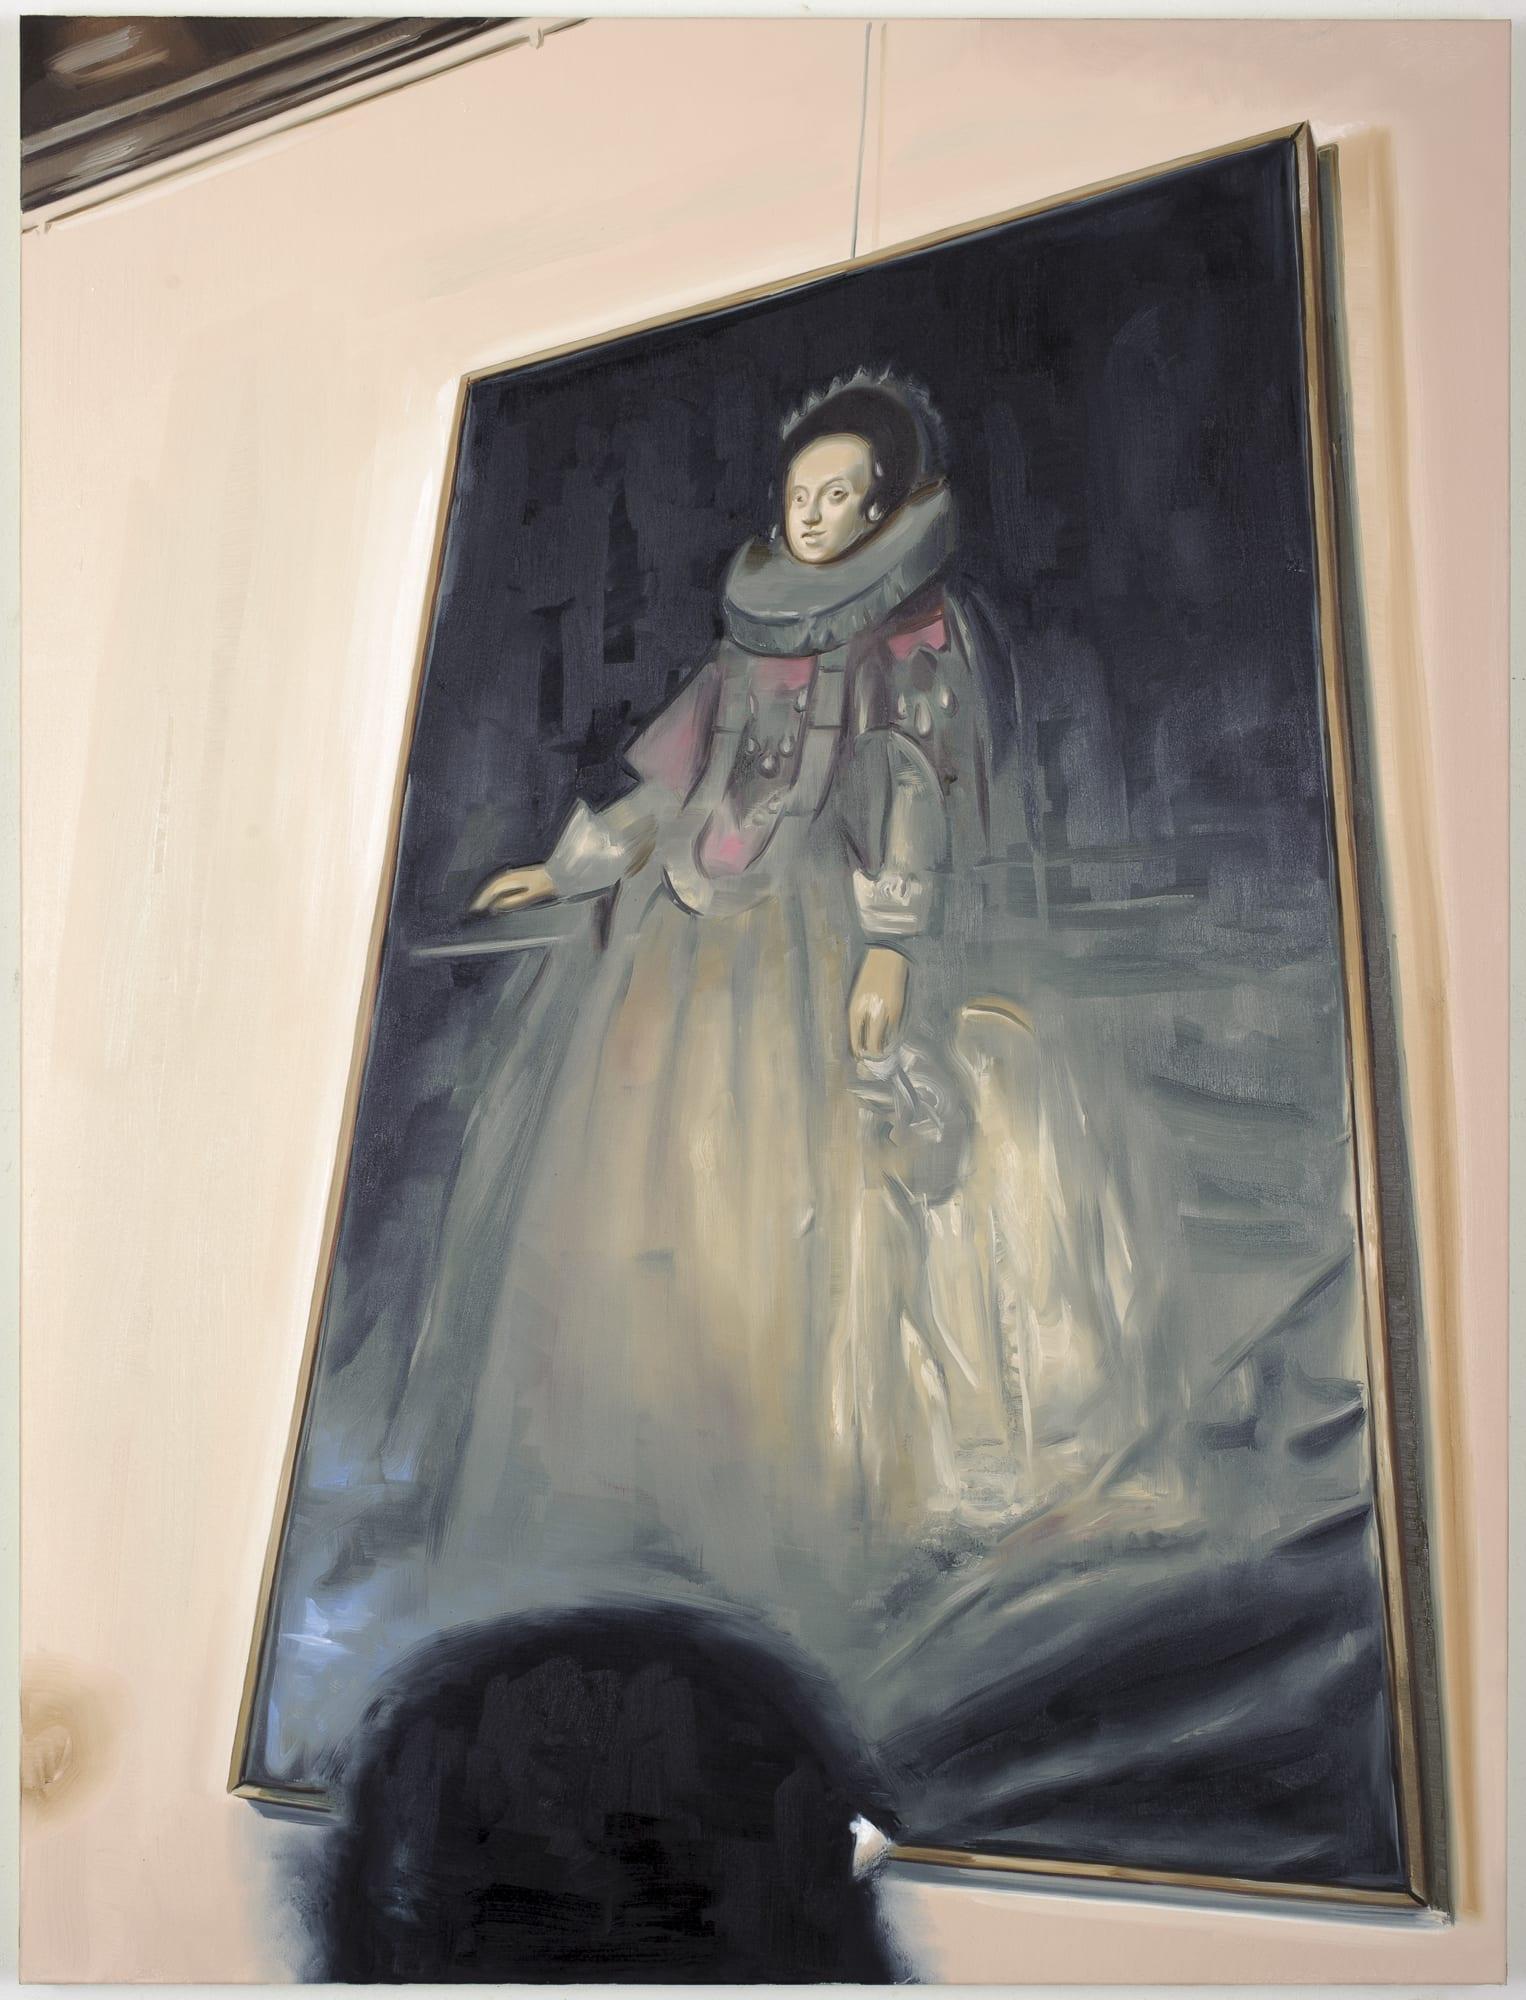 Marcin Maciejowski, Constance of Austria (Pieskowa Skala Castle) (2019); Private View at Thaddaeus Ropac Ely House 2019